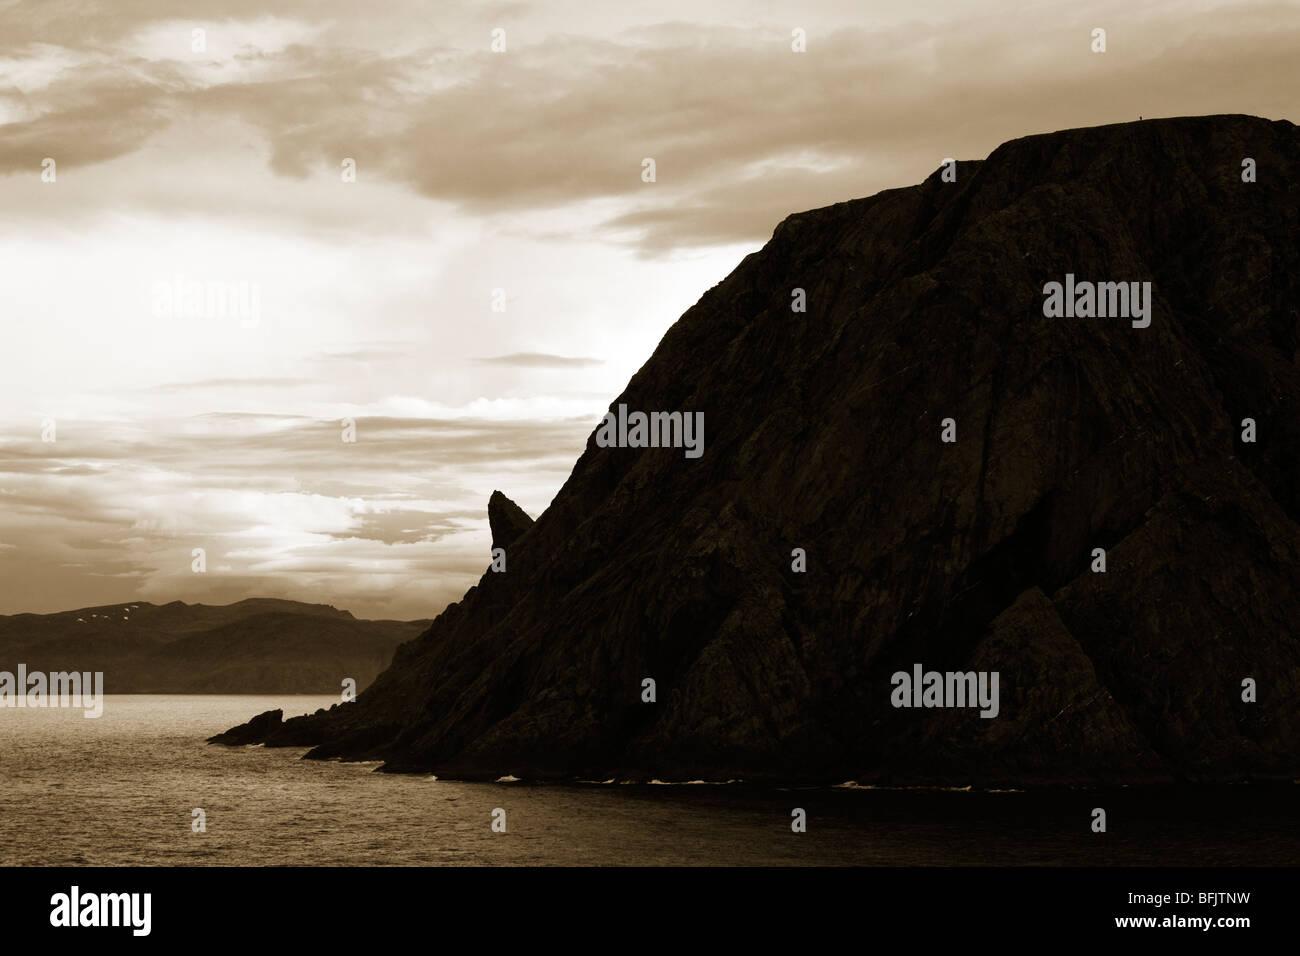 Horn Rock Formation, North Cape, Honningsvag Port, Mageroya Island, Finnmark Region, Arctic Ocean, Norway, Scandinavia - Stock Image